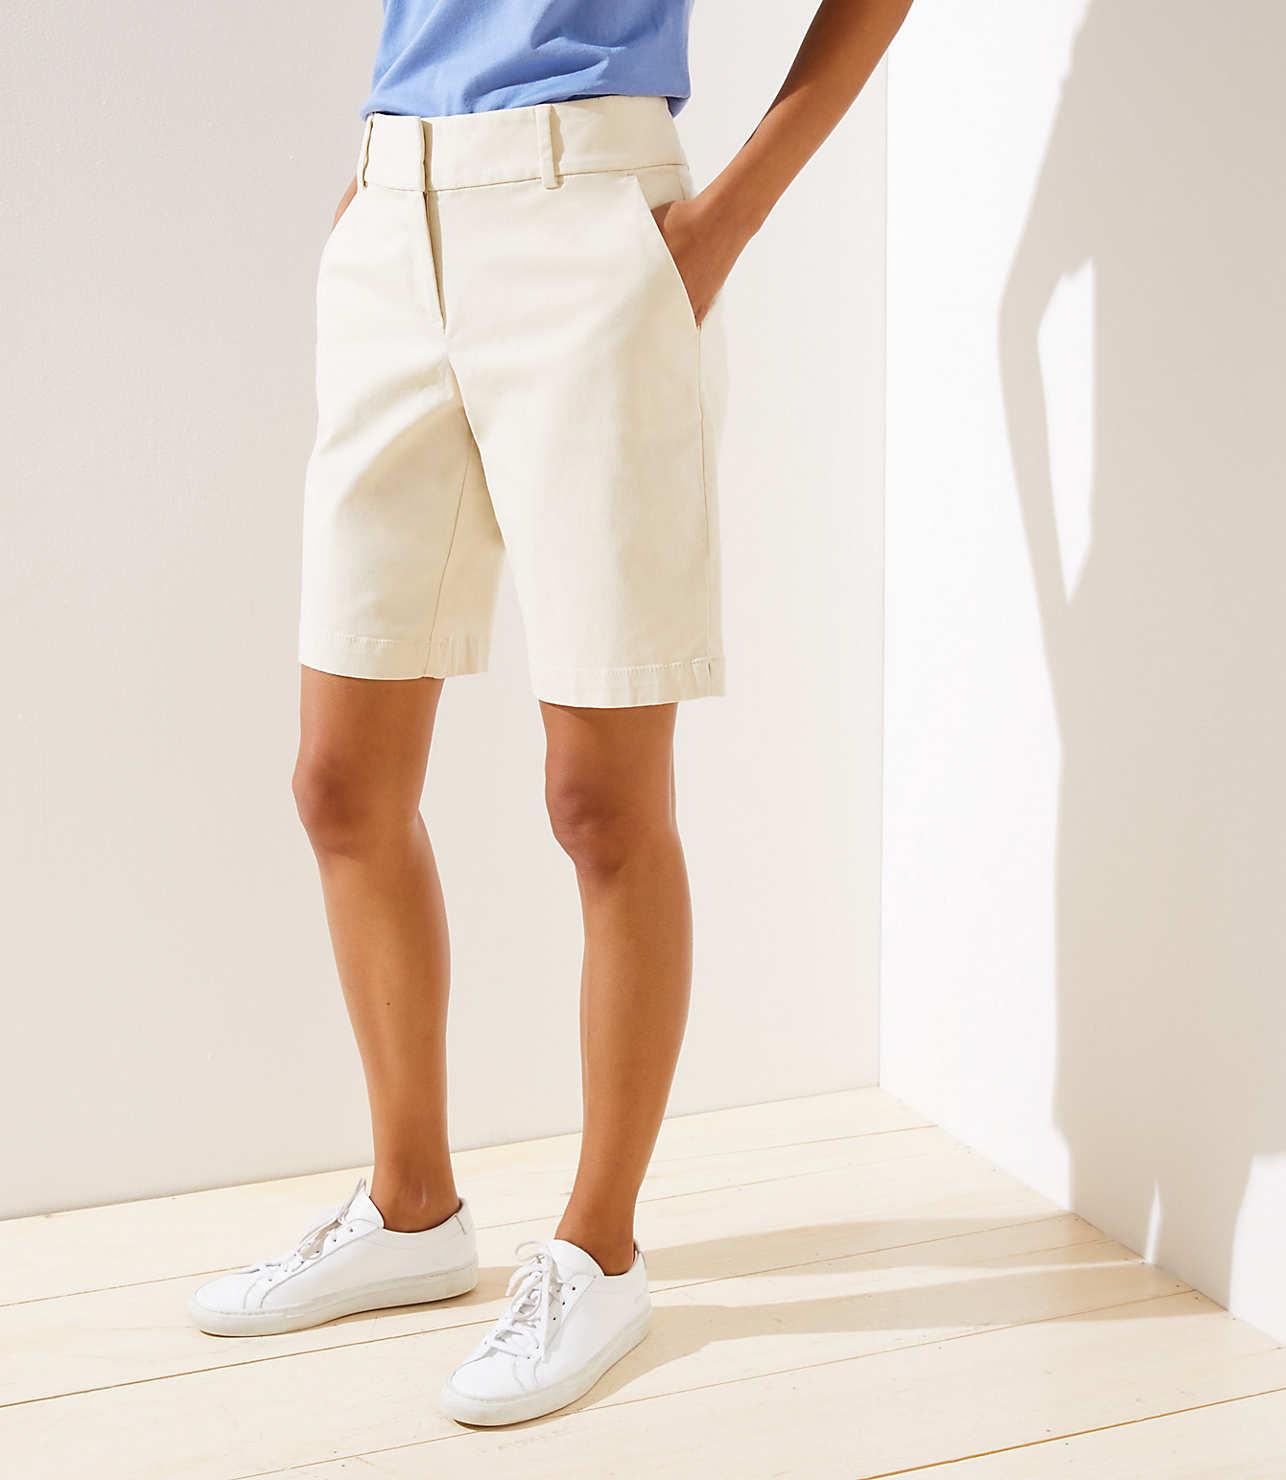 Curvy Riviera Shorts with 10 Inch Inseam | LOFT